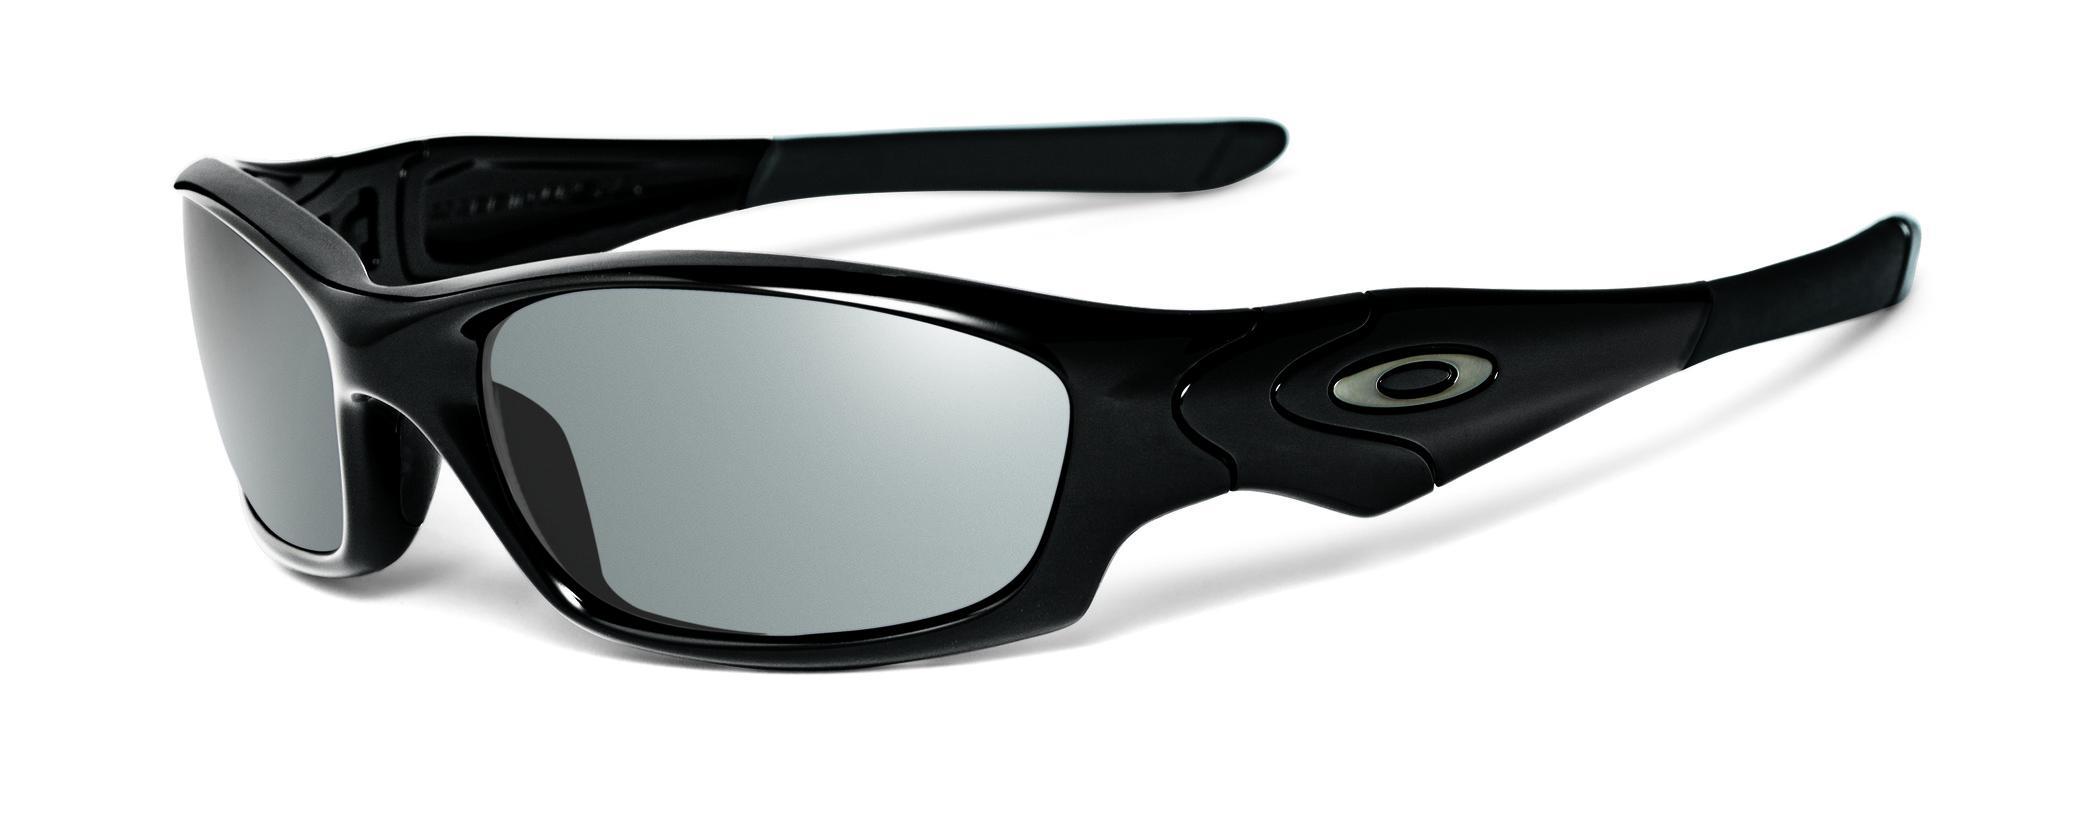 eblkp Buy Oakley Sunglasses | Lenstore.co.uk | Cheap Ray Ban ...